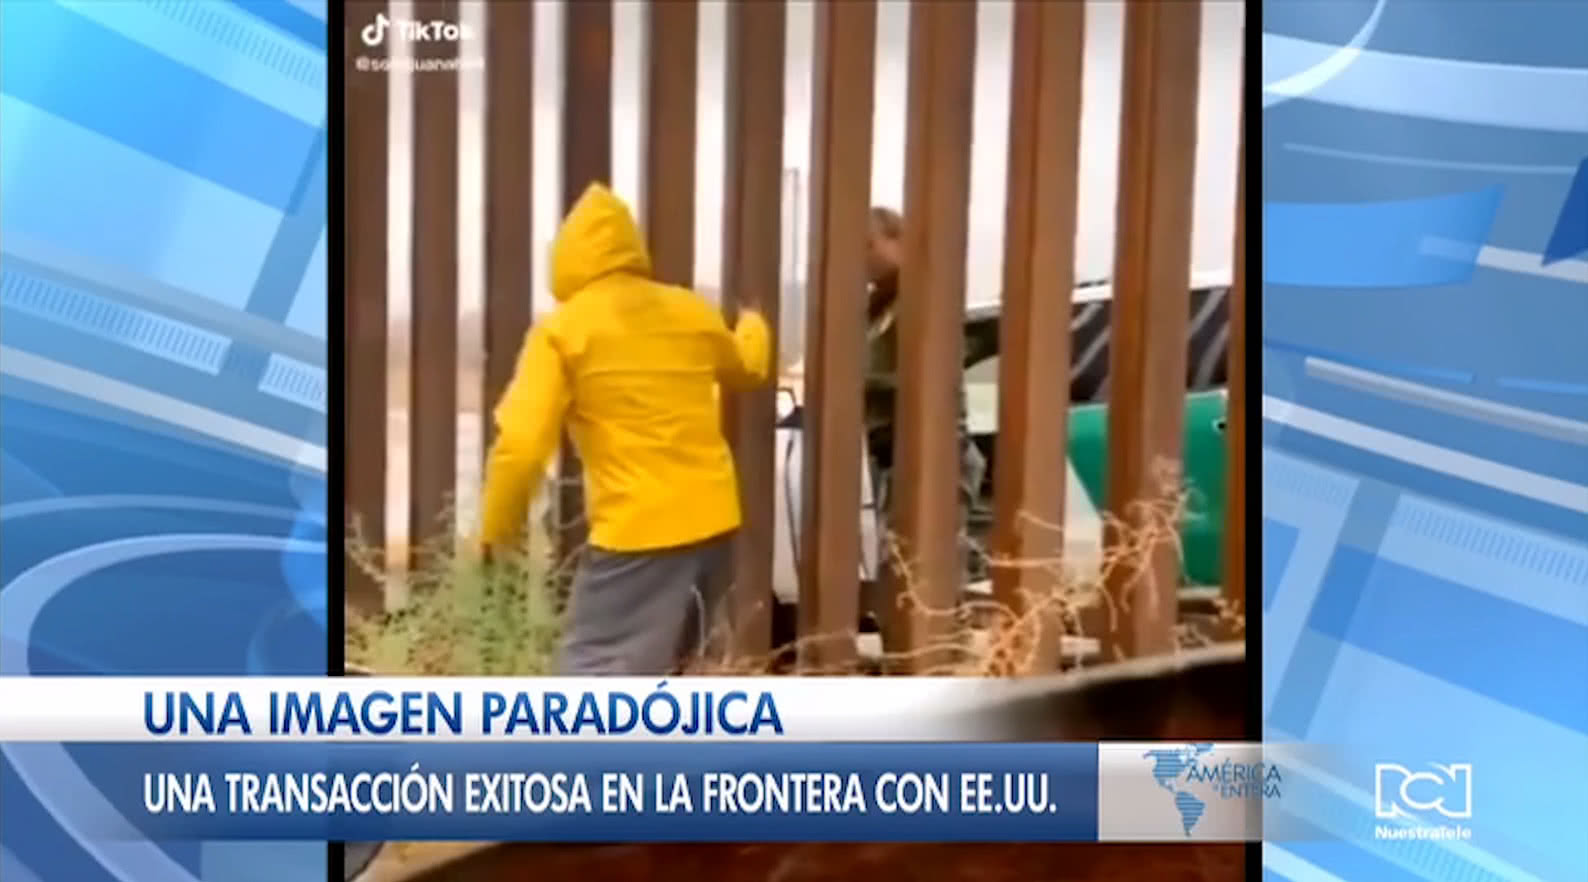 Video de mexicano que le vende un tamal a un agente de Ia Patrulla Fronteriza se vuelve viral en redes sociales